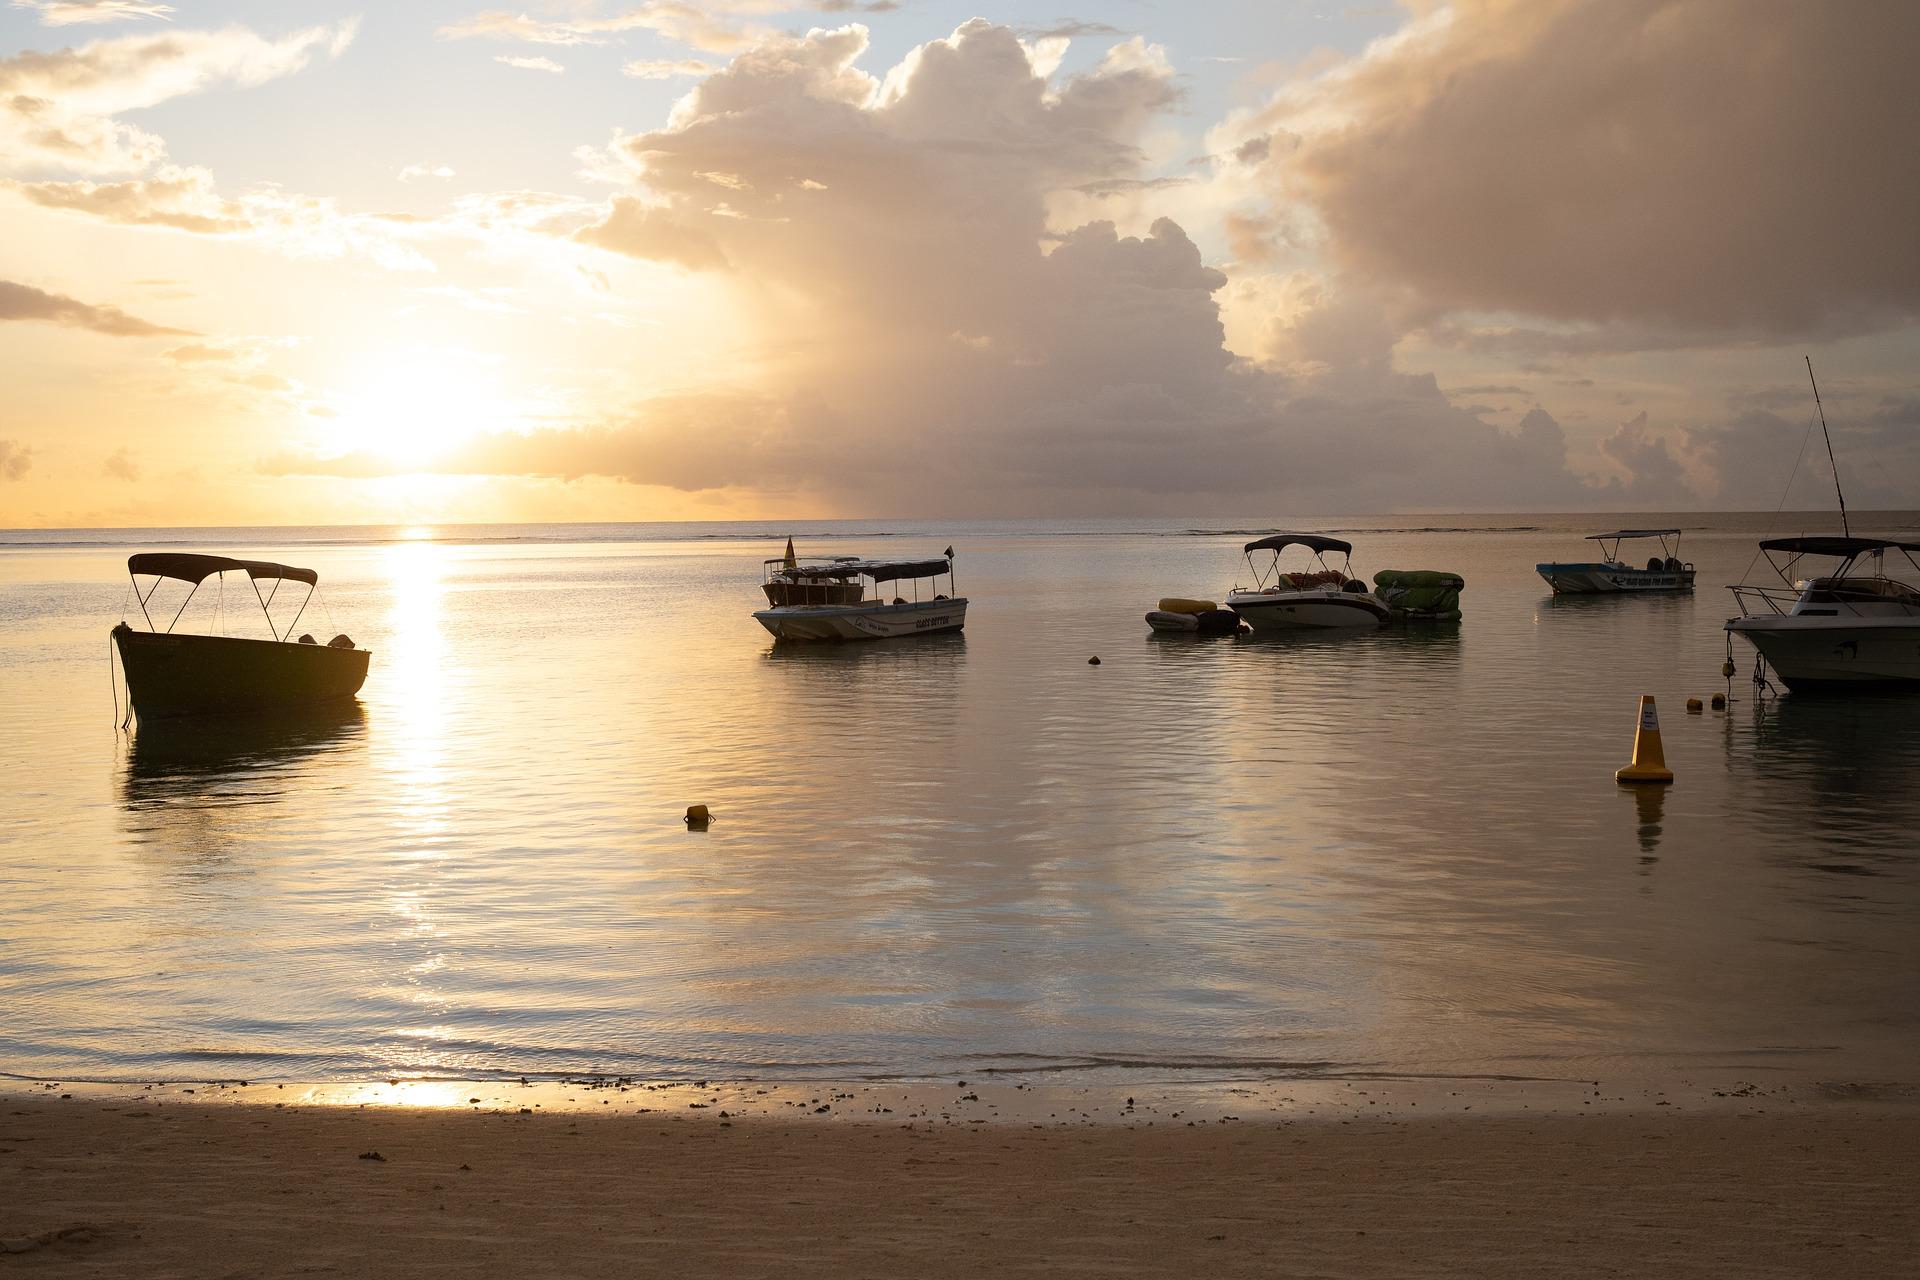 séminaire île maurice